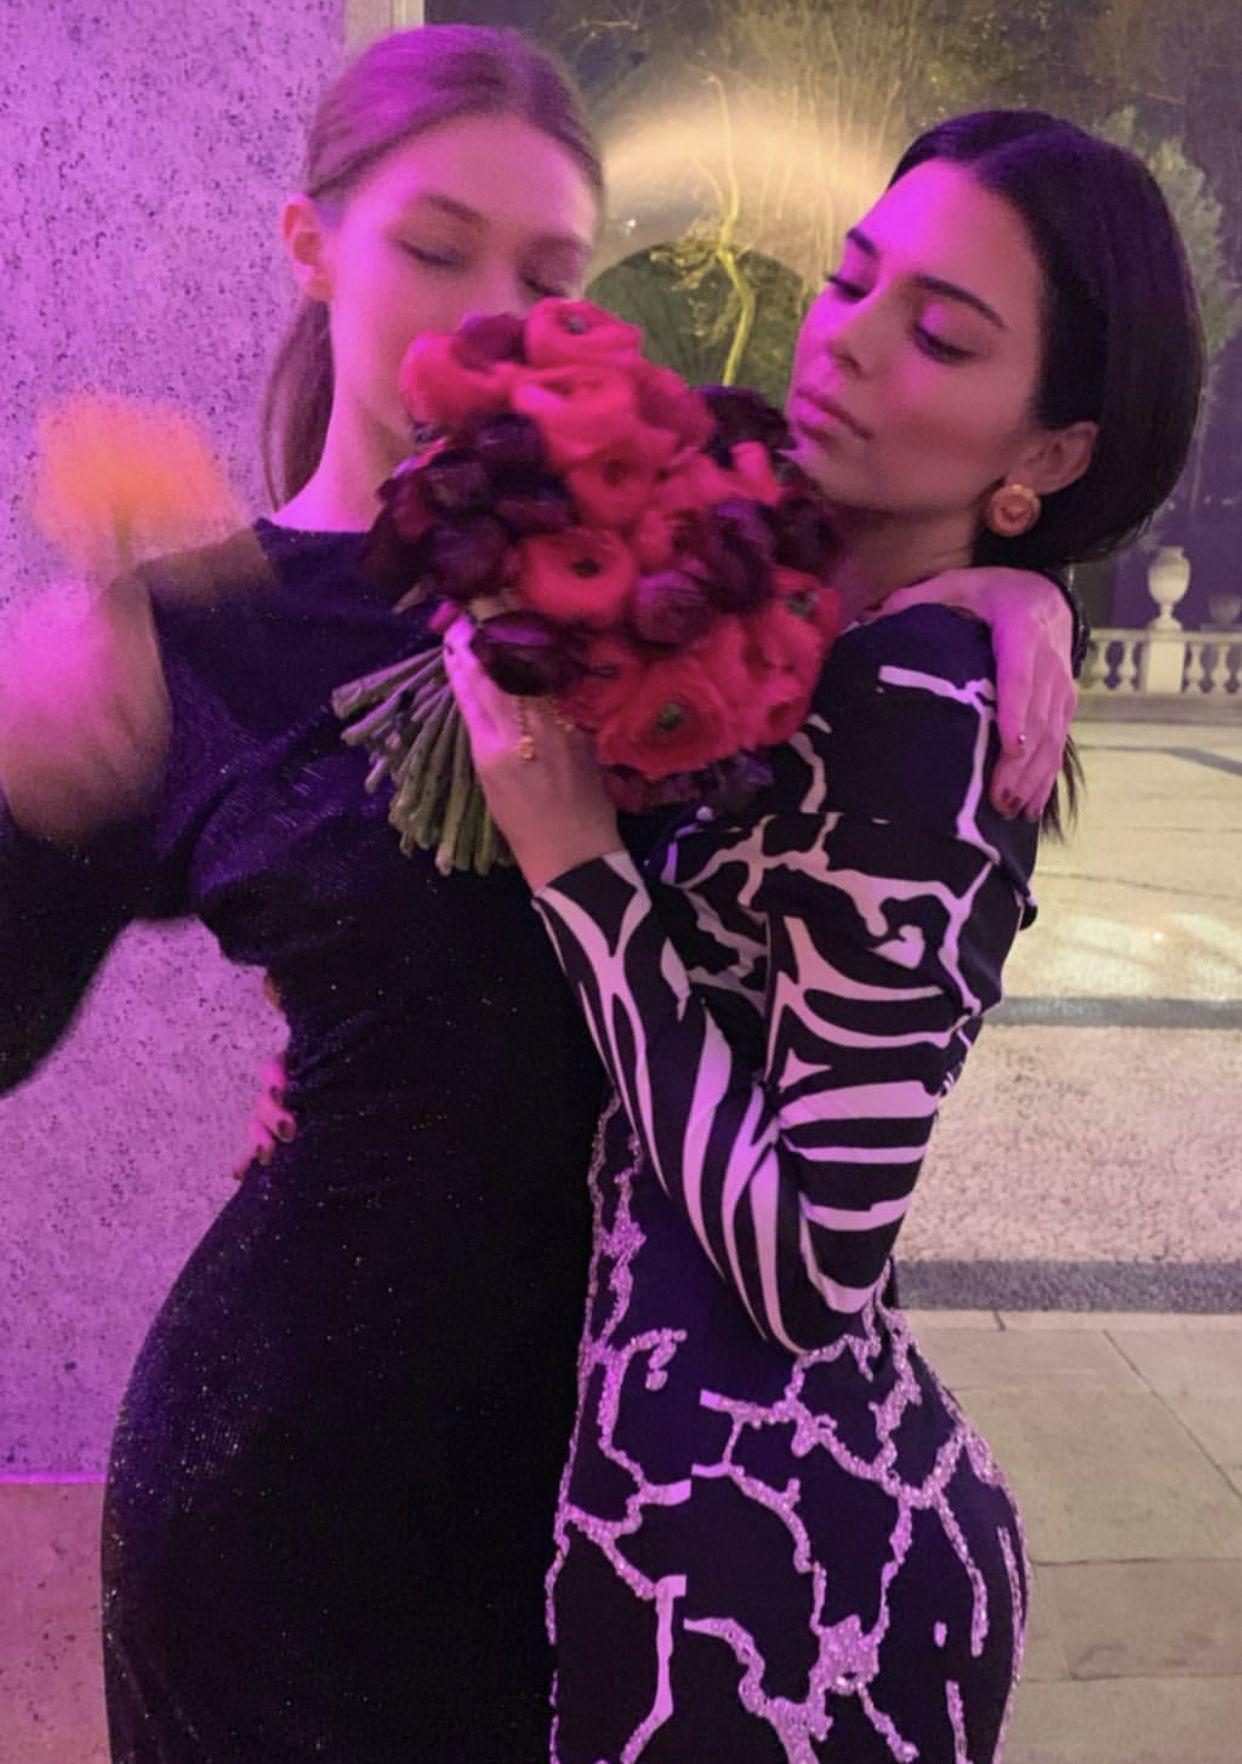 Gigi Hadid | January 24th 2016 | Full Snapchat Story | ft